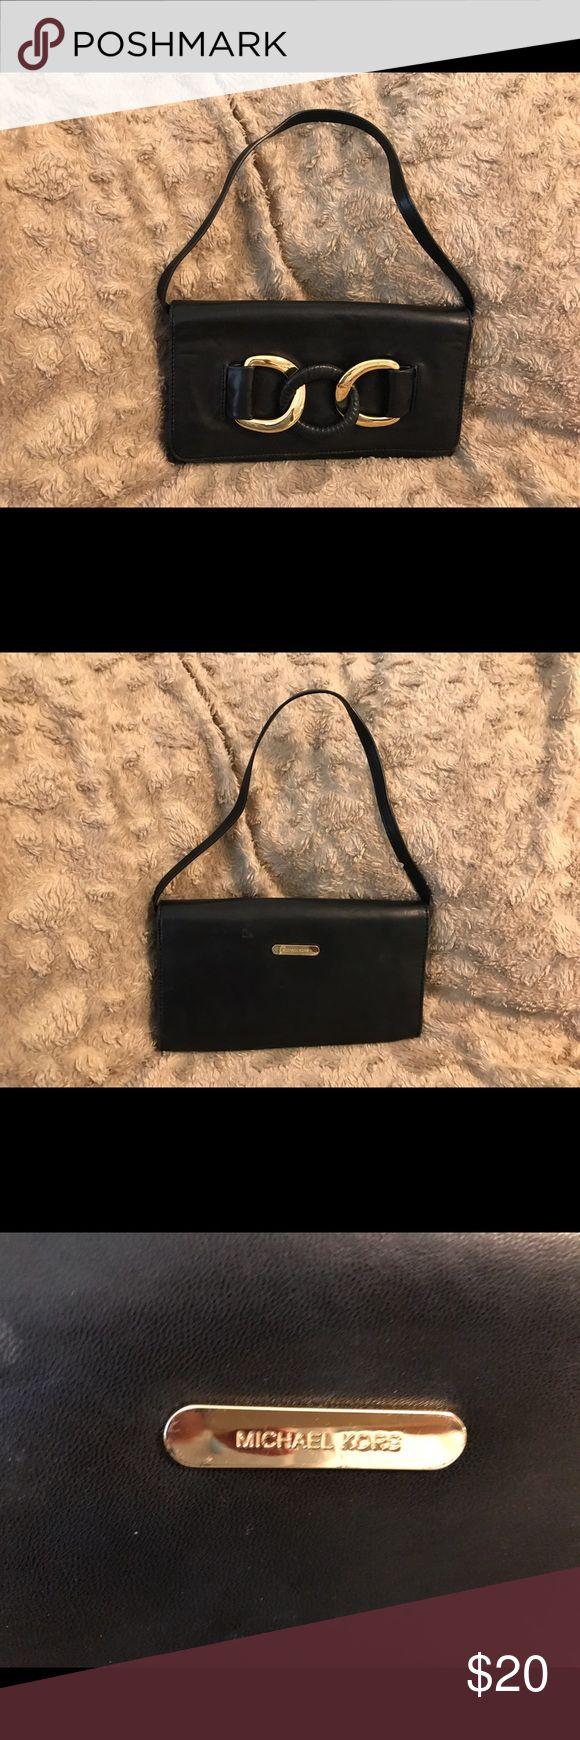 Michael Kors small black bag Soft black leather. Evening bag MICHAEL Michael Kors Bags Mini Bags